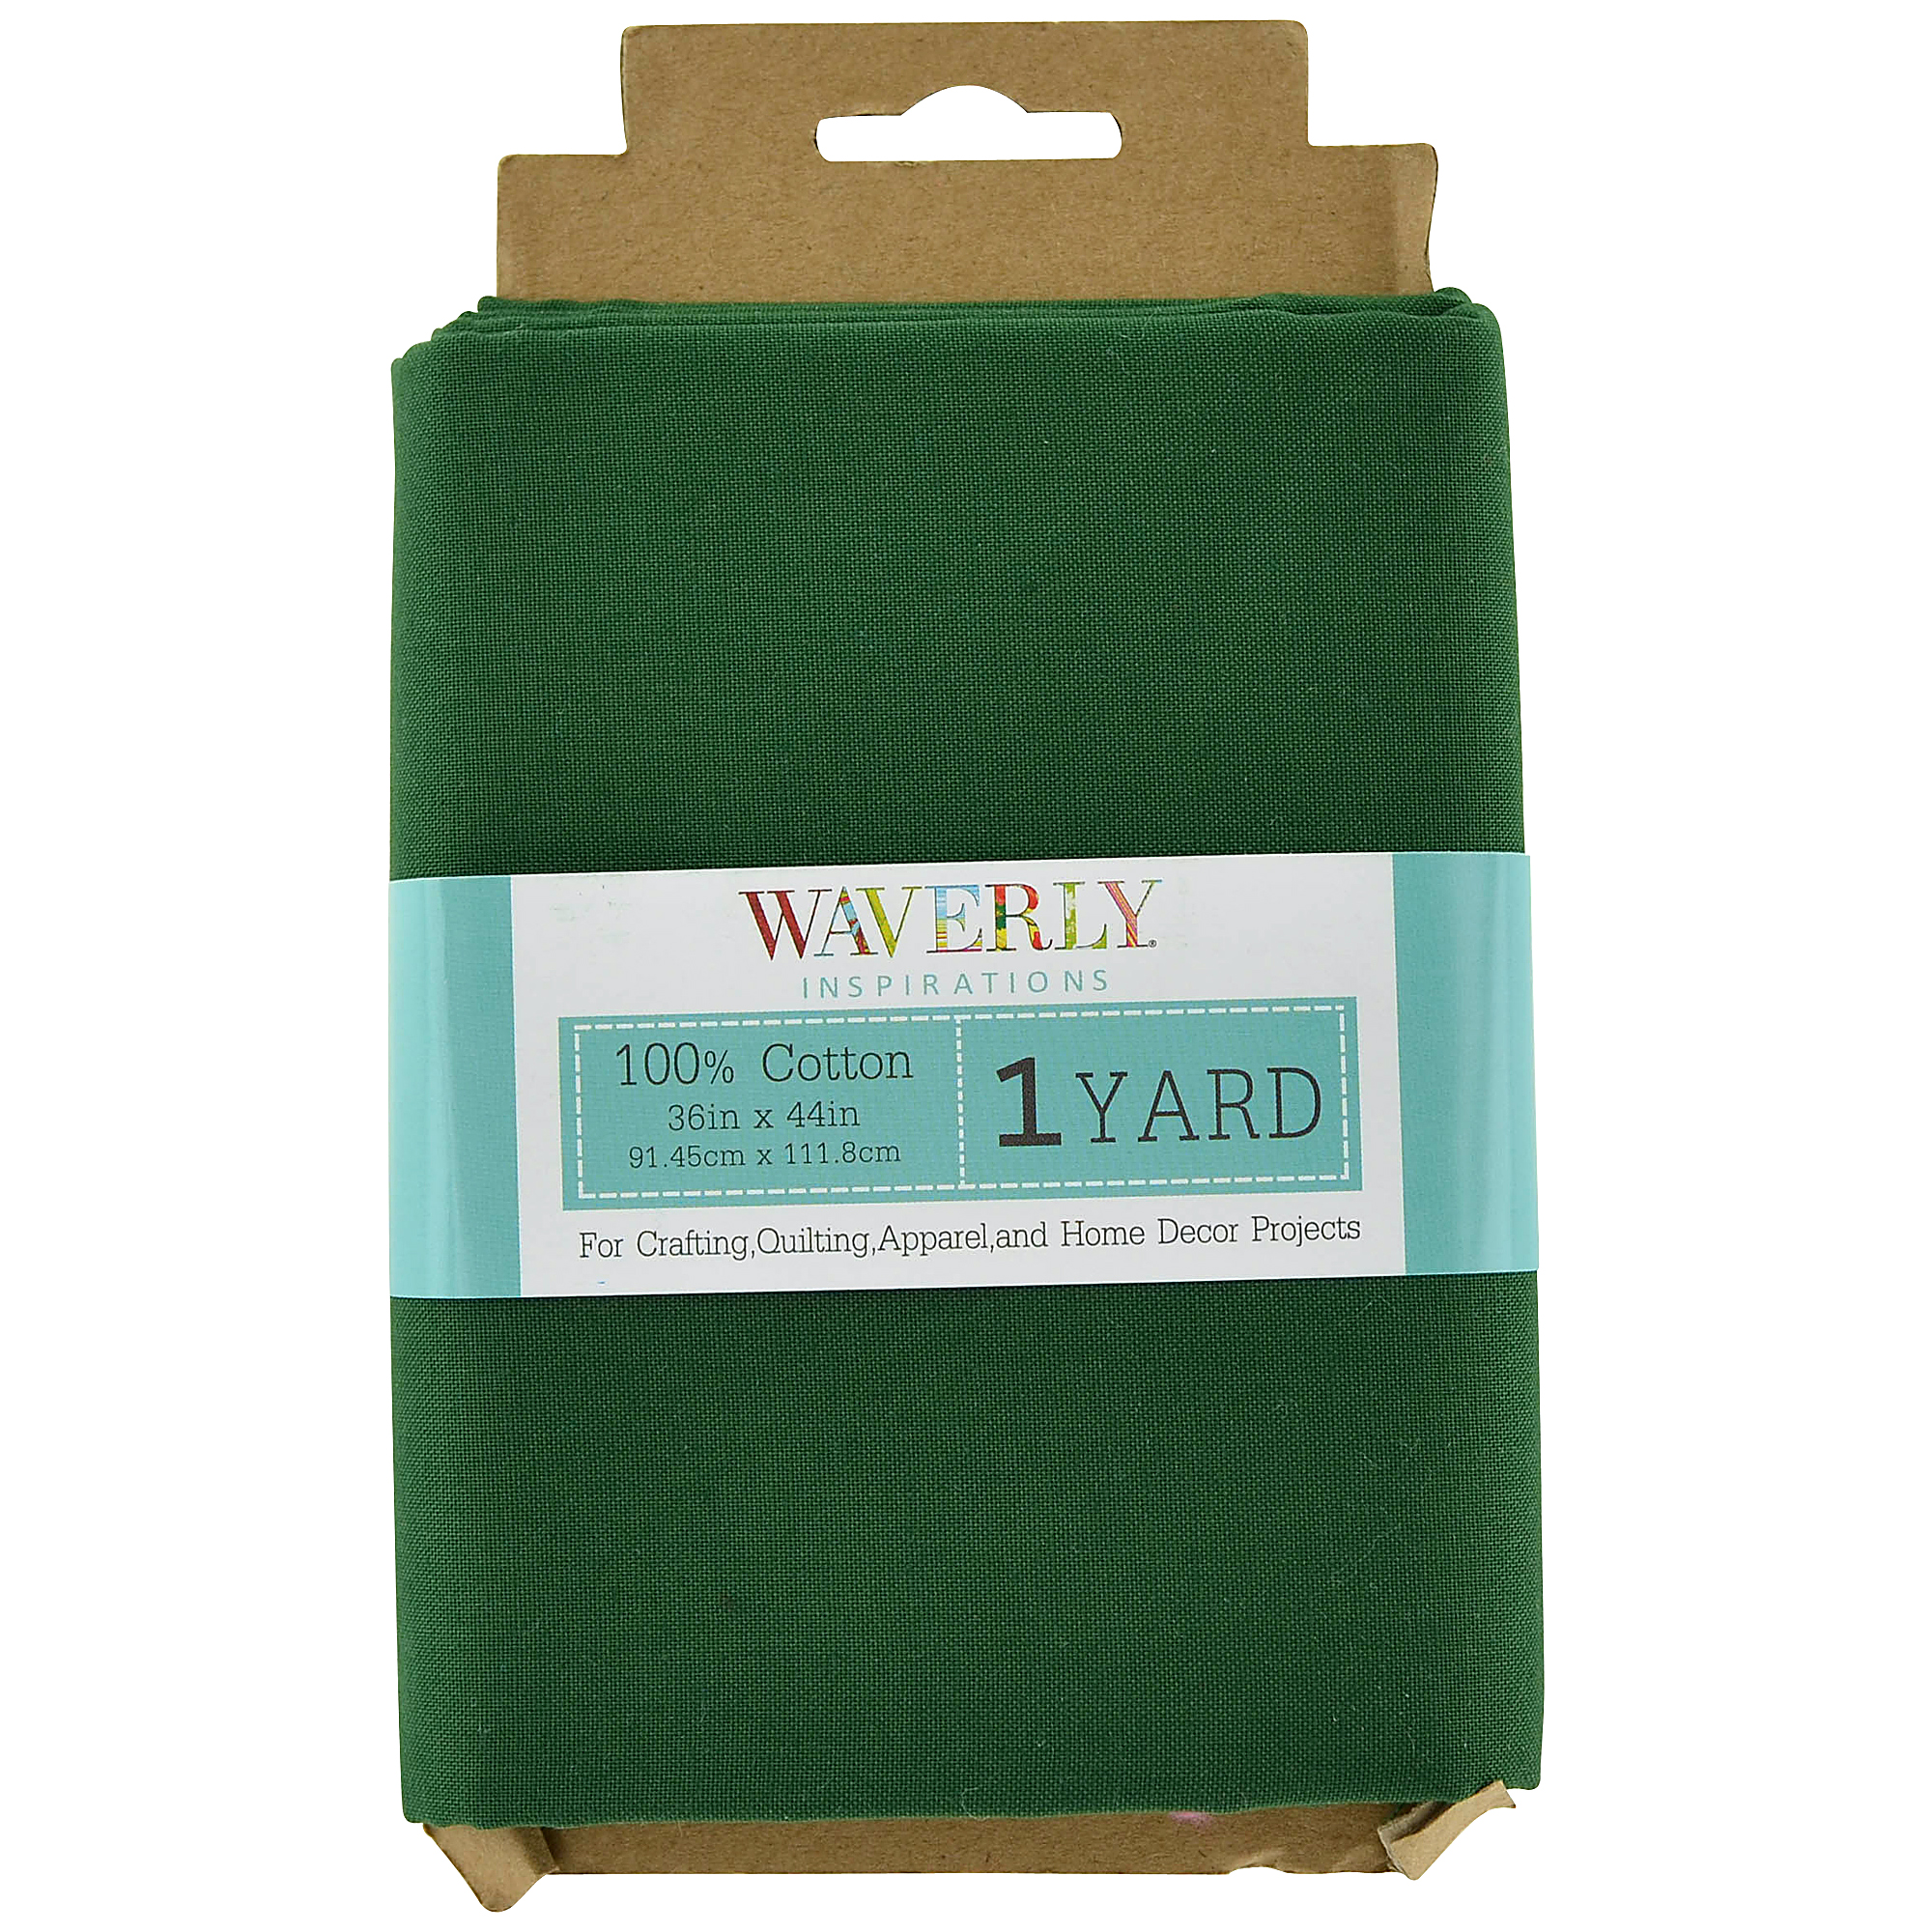 Waverly Inspirations 100% Cotton Fabric 1 yd Evergreen